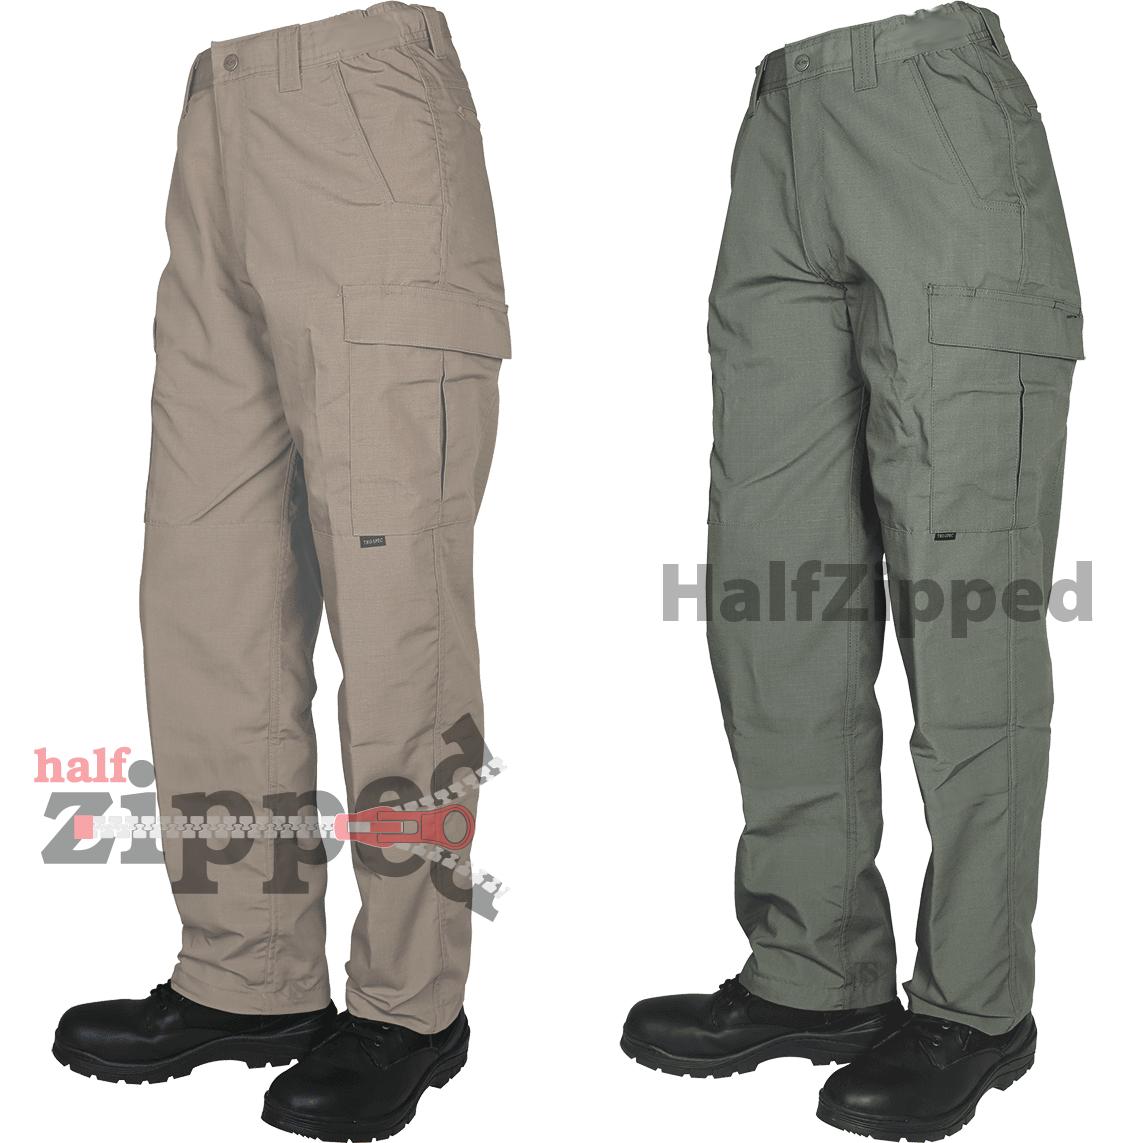 TRU-SPEC 24-7 Men's RANGE TACTICAL PANTS Cargo for Duty Trai